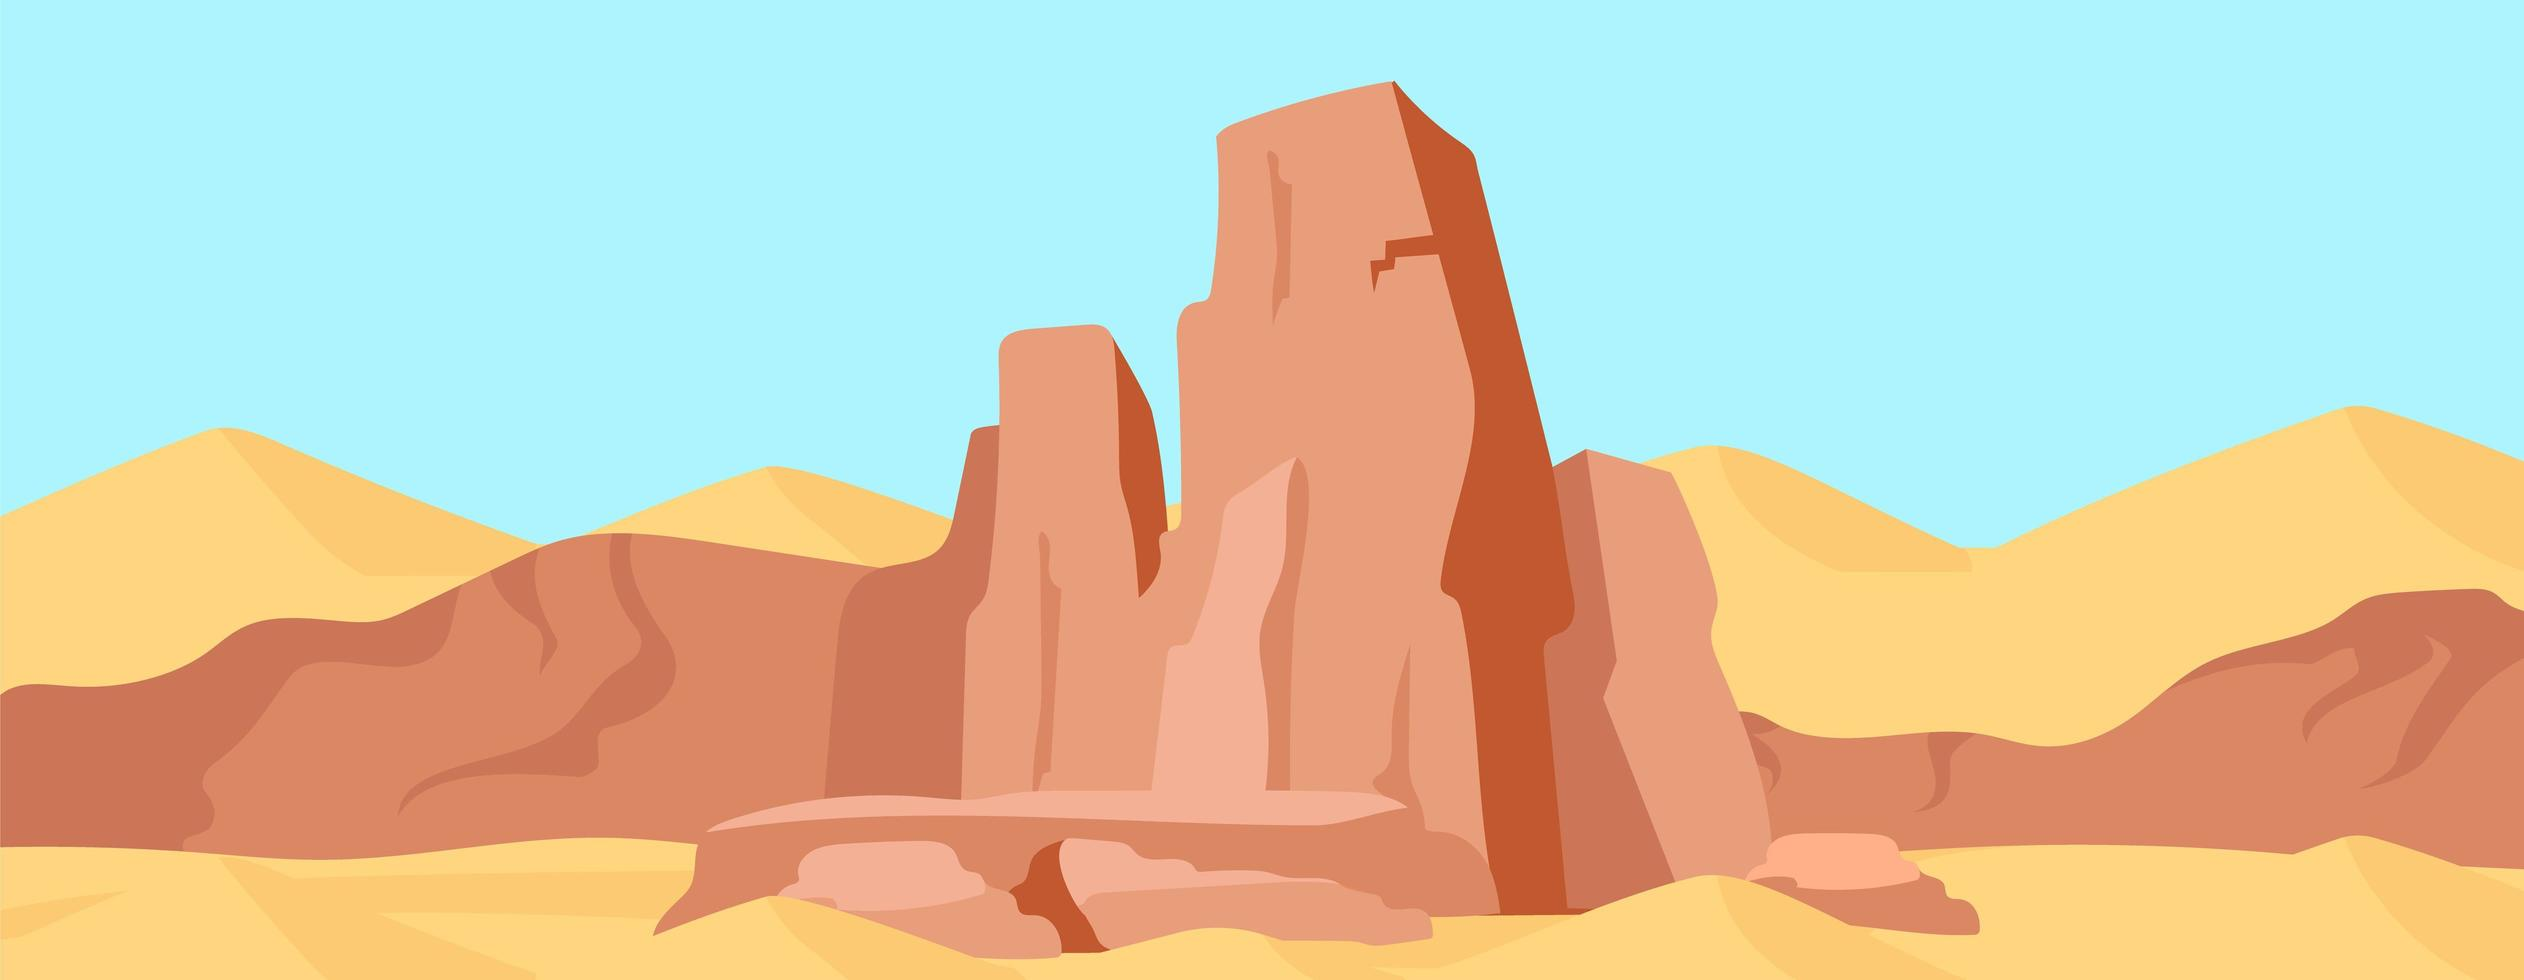 canyon rock scène vector